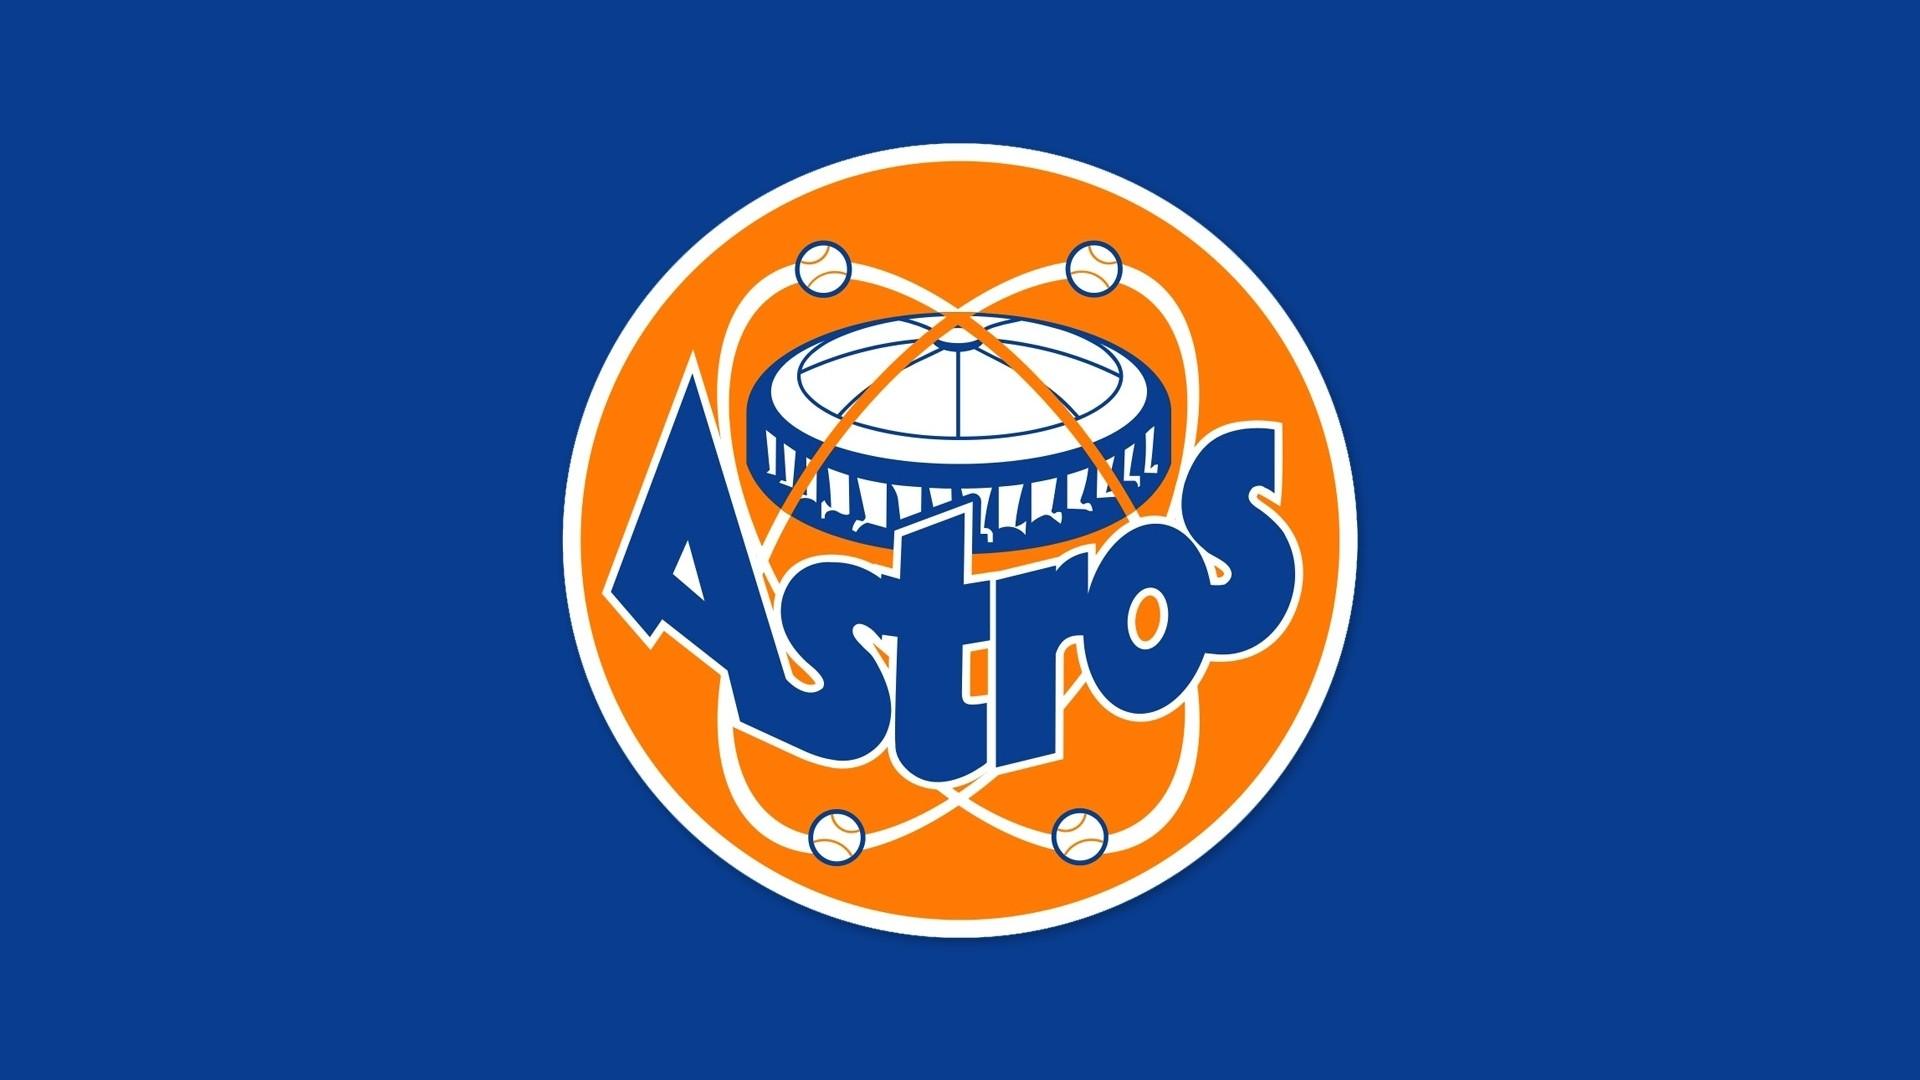 Astros hd wallpaper download